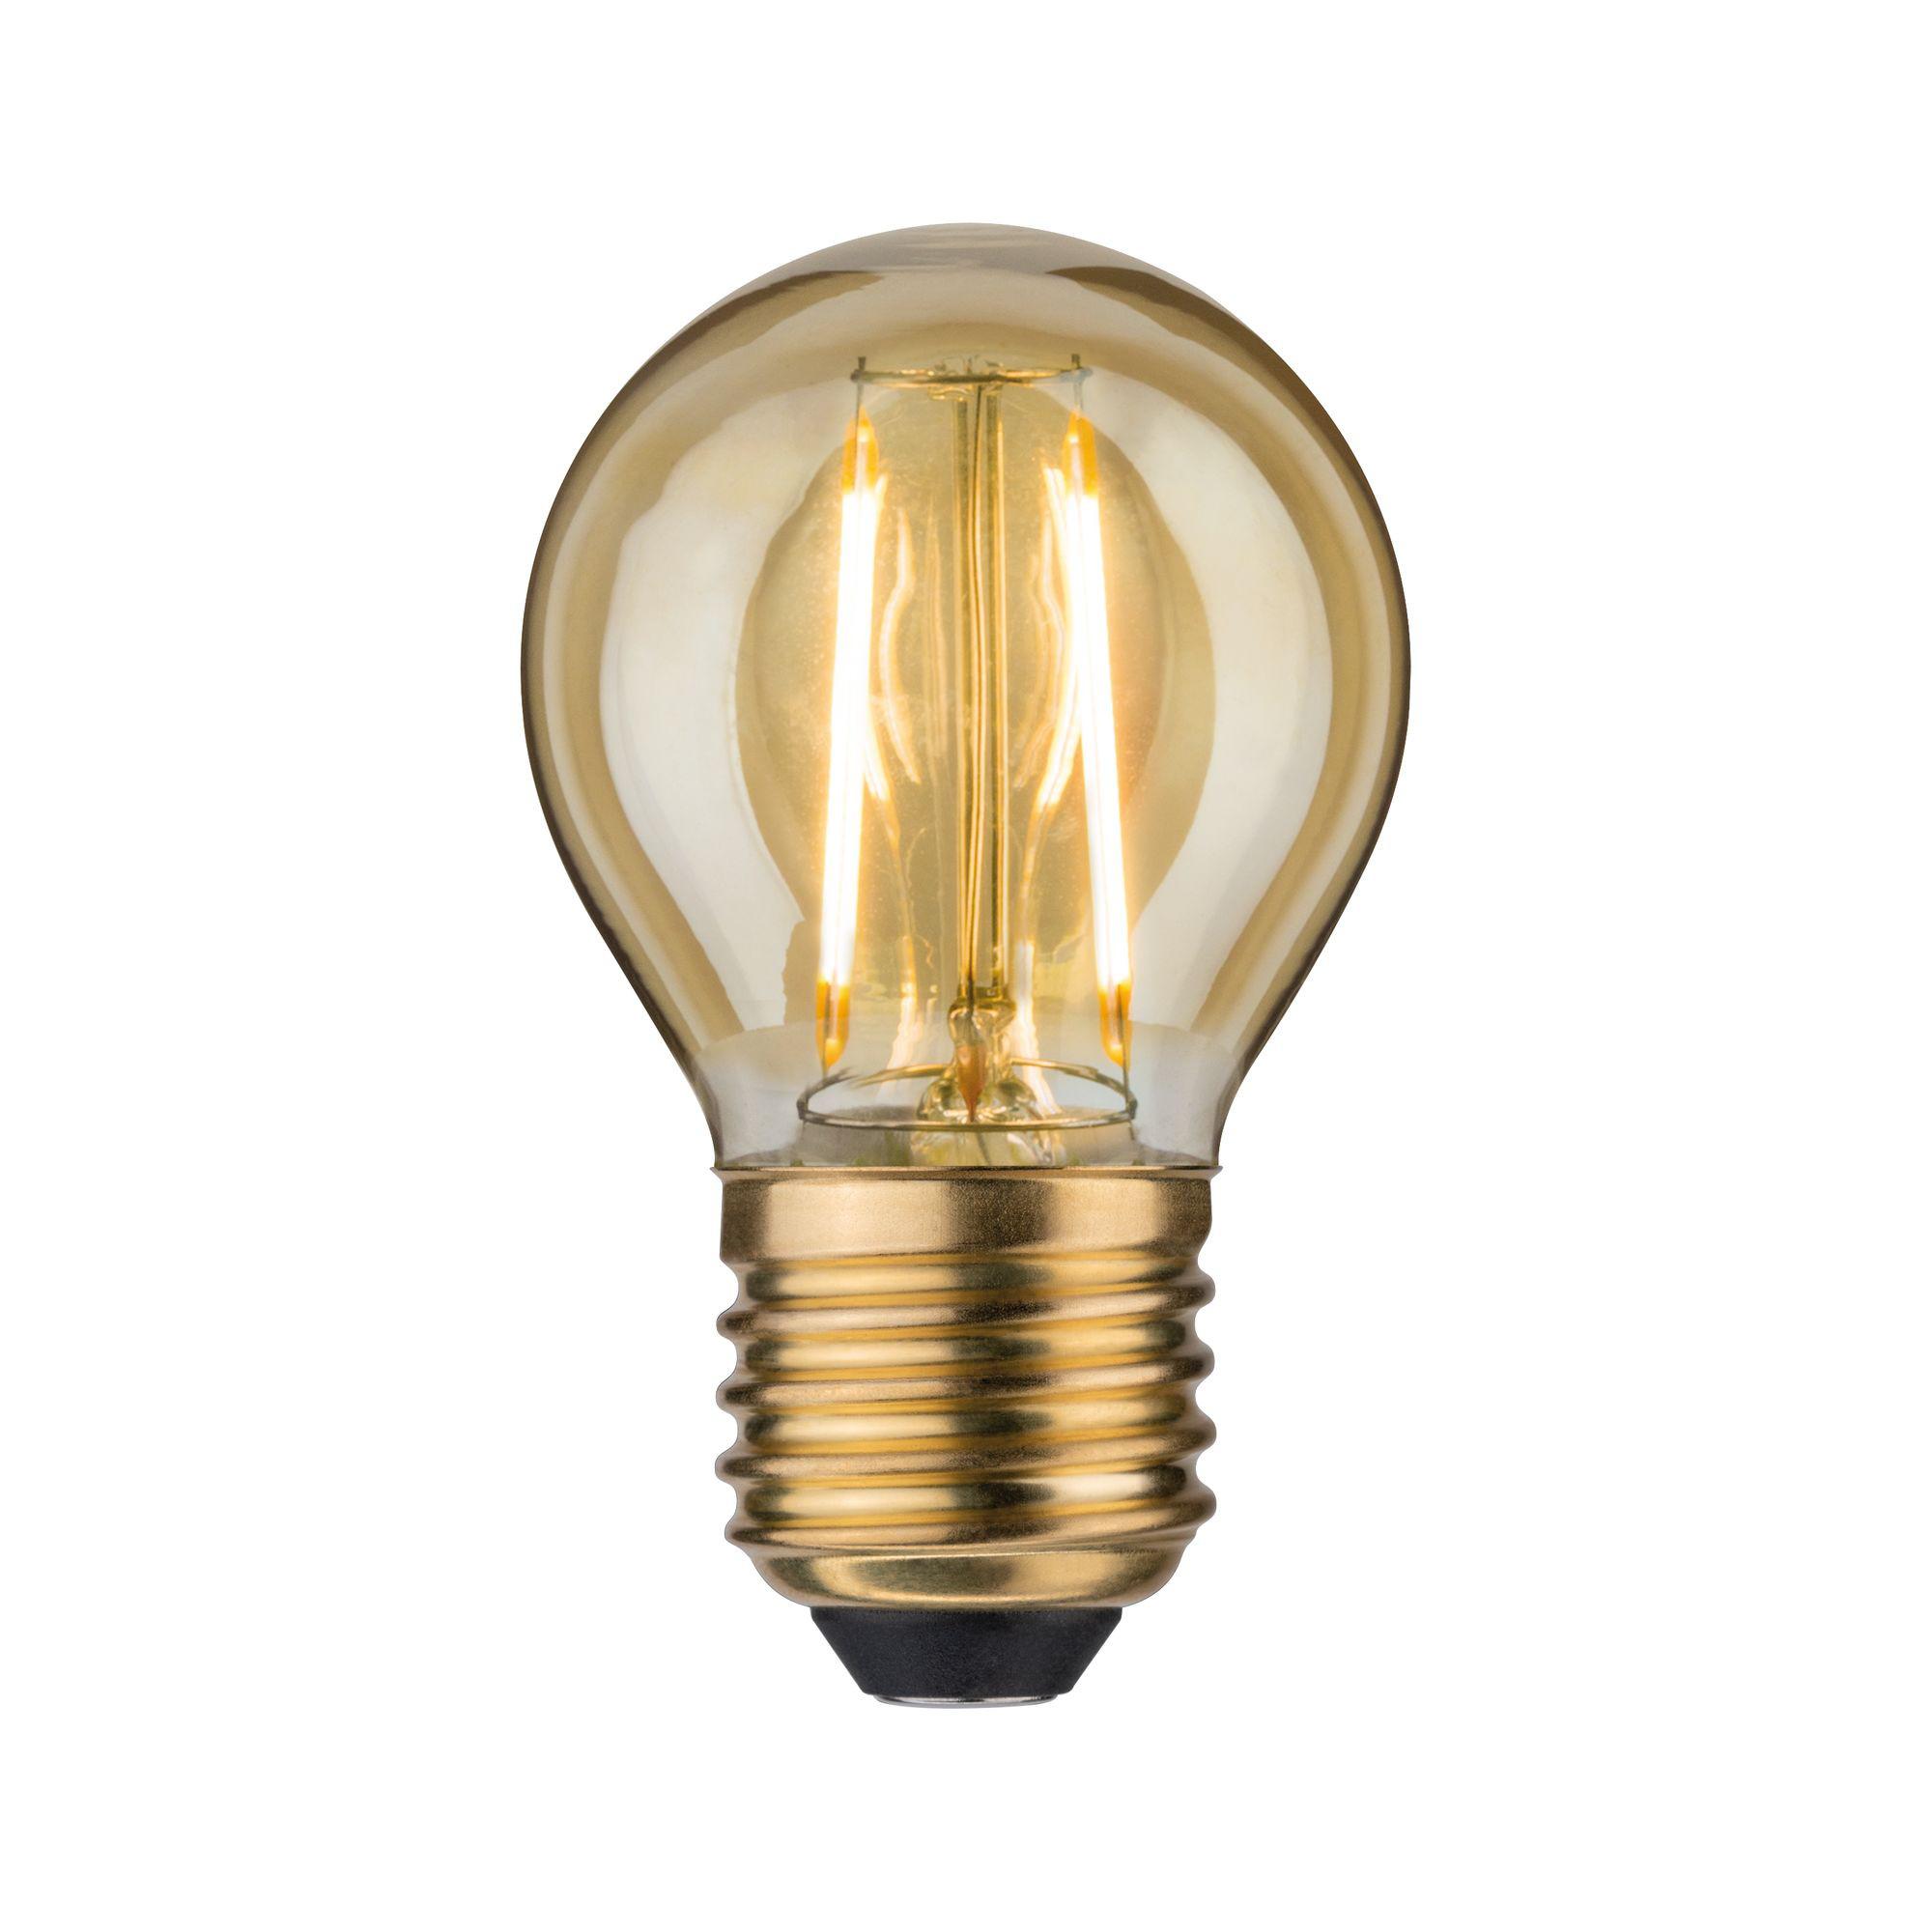 Лампа филаментная Paulmann Капля 2.5Вт 200лм 2500К Е27 230В Золото 28382.